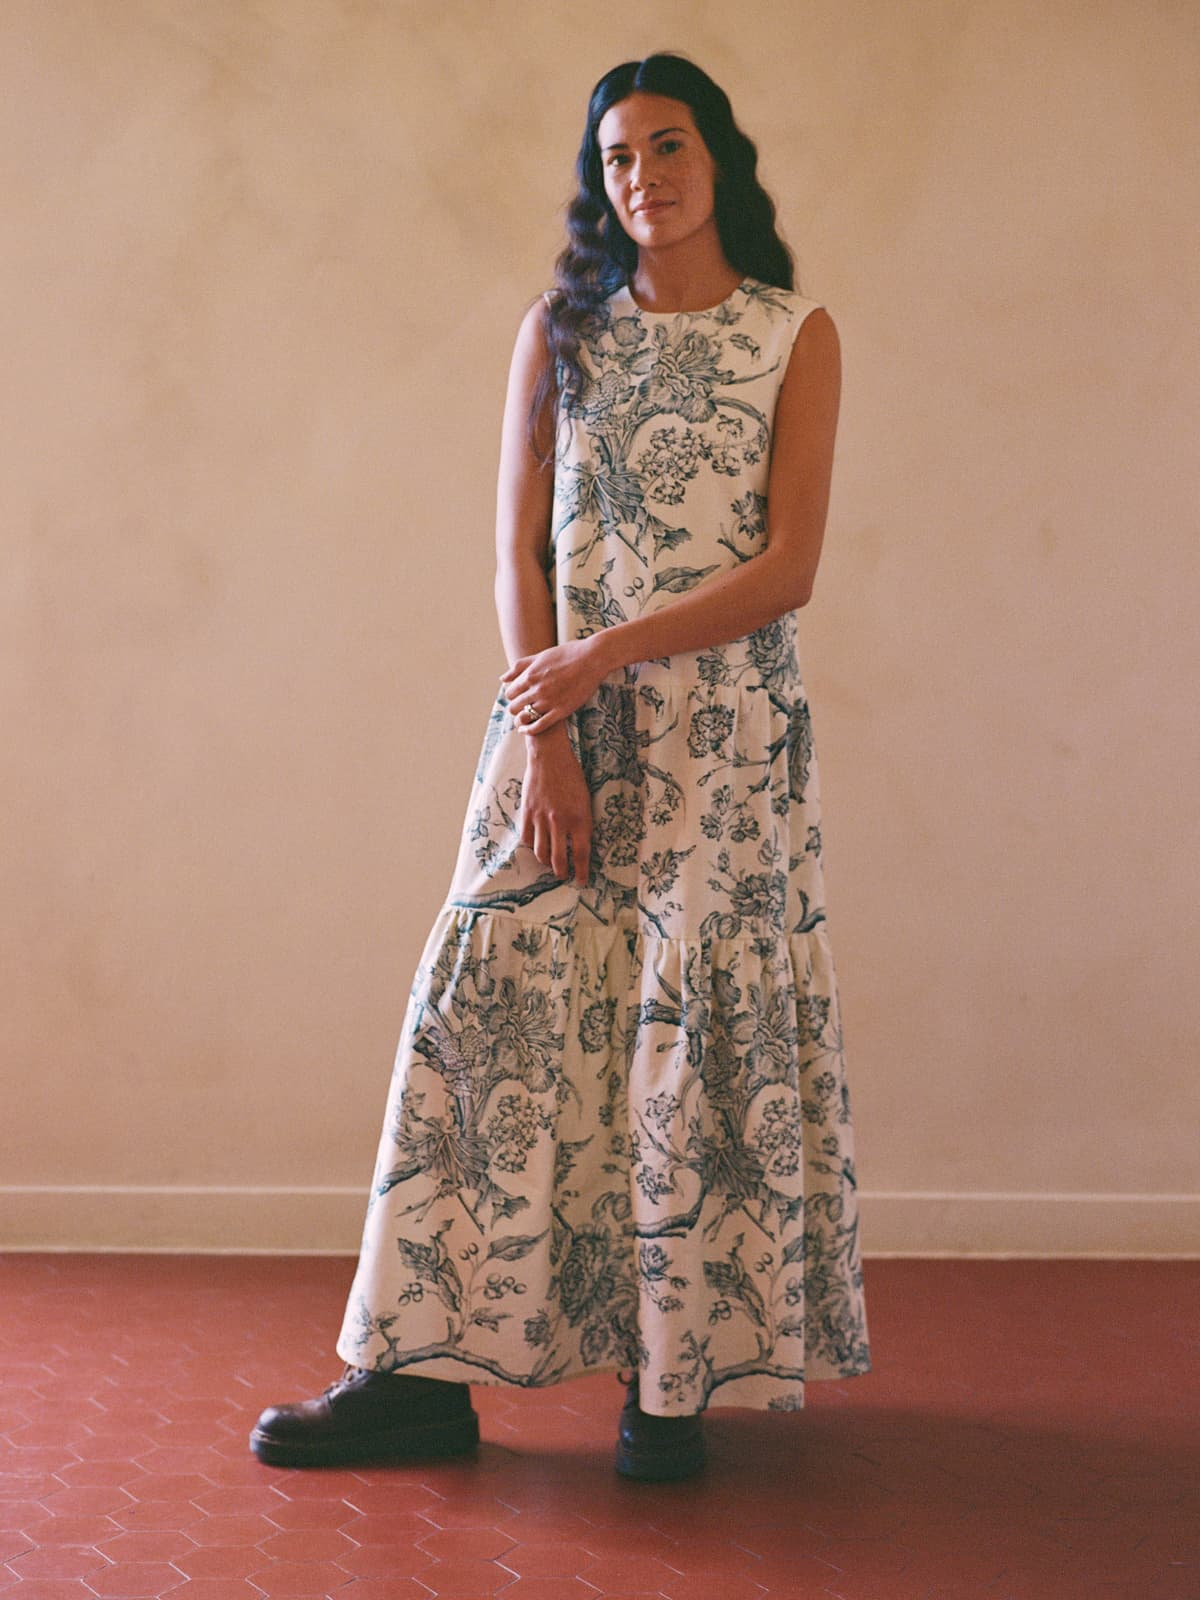 modular toile de Jouy dress